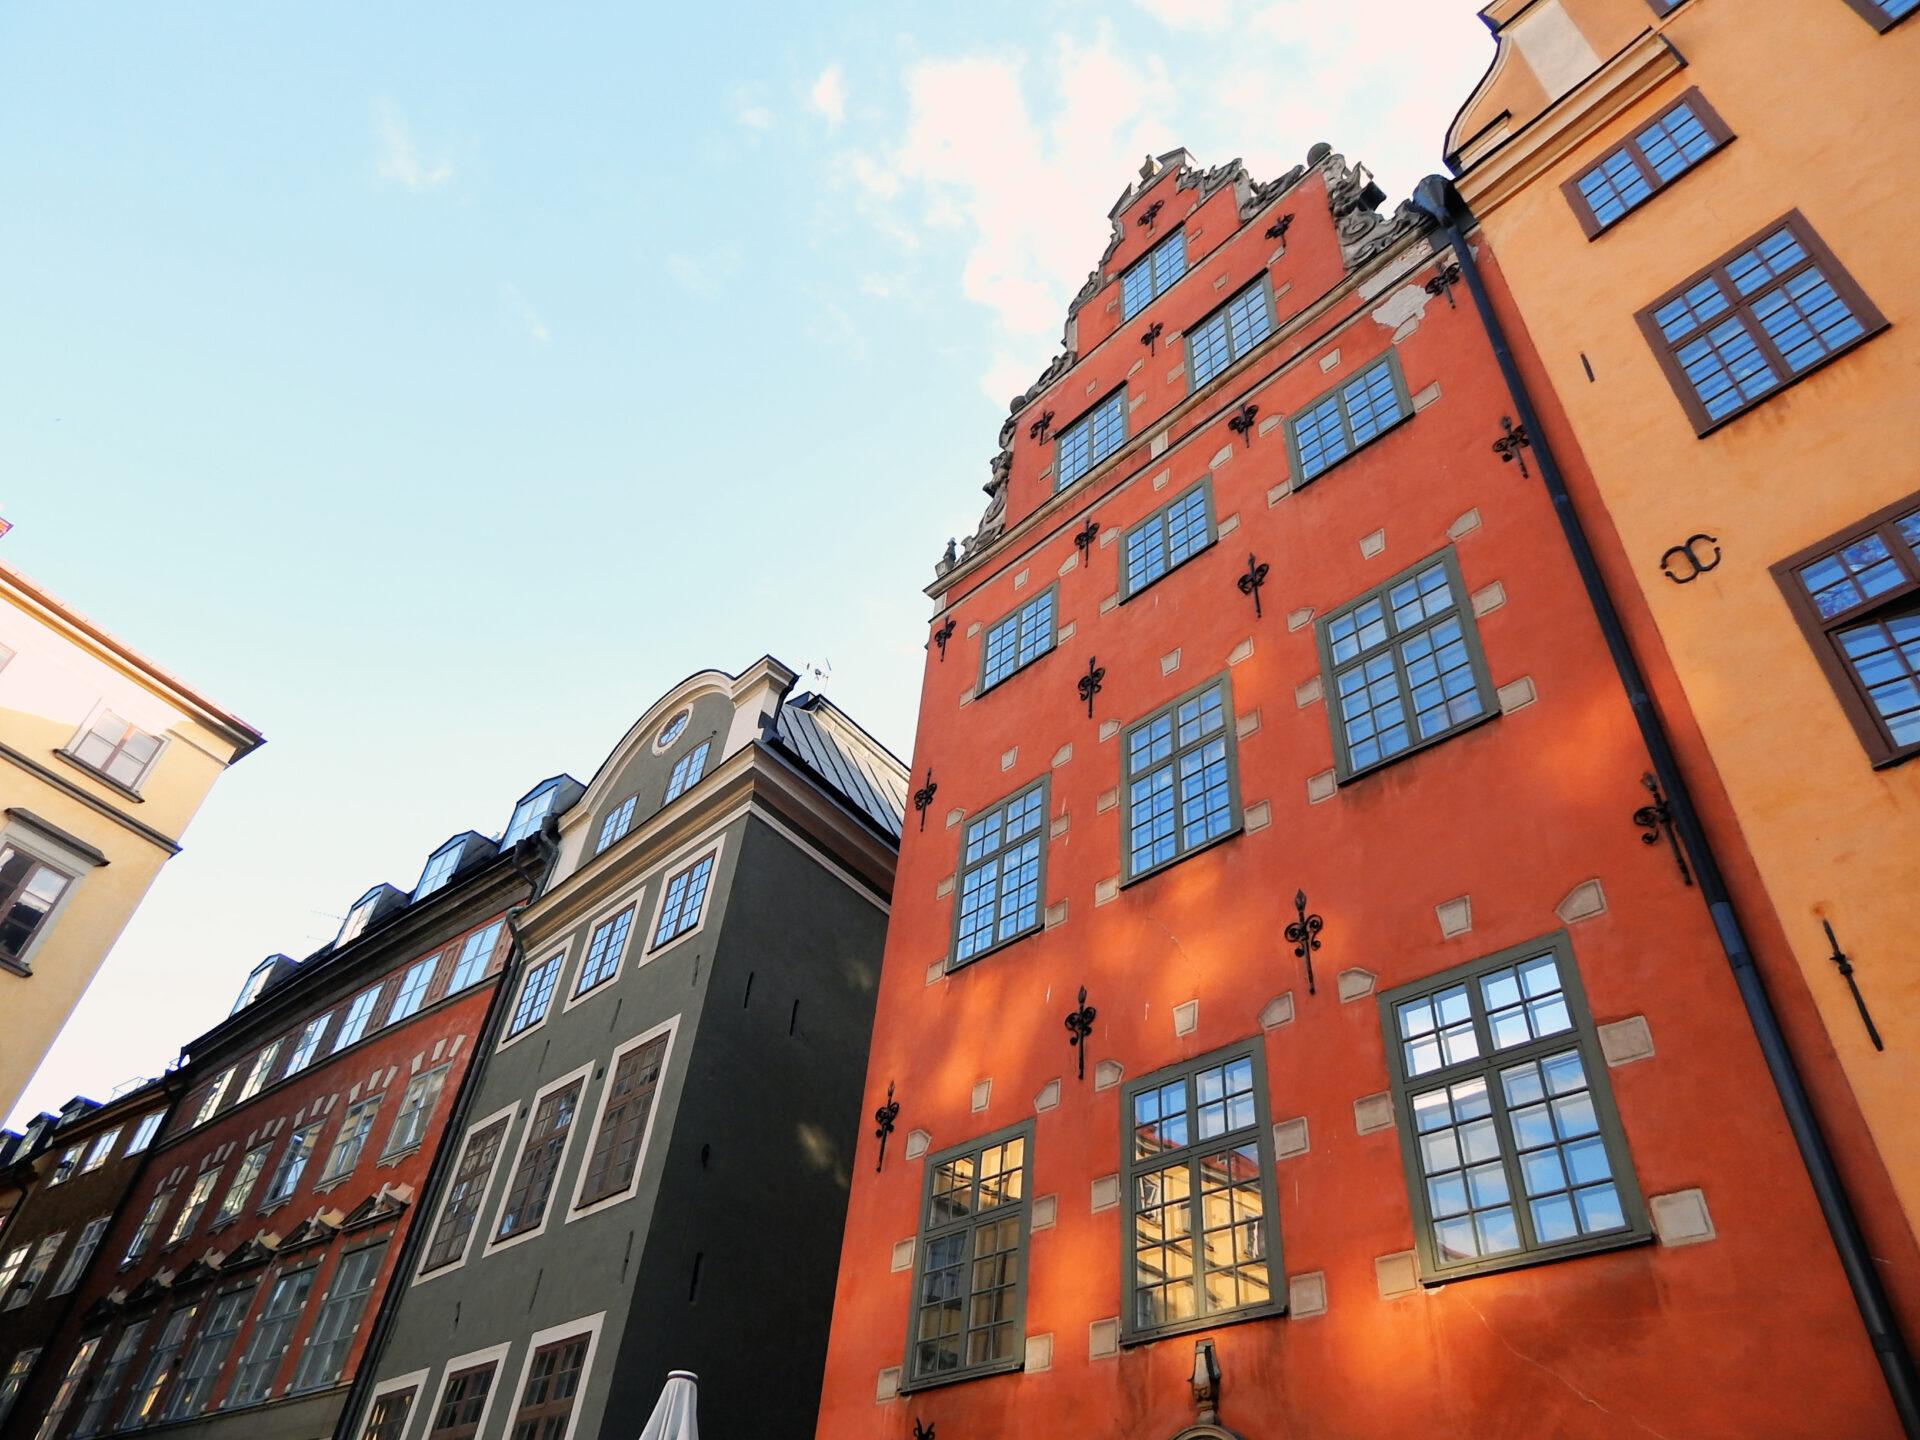 Schweden - Stockholm Gamla Stan